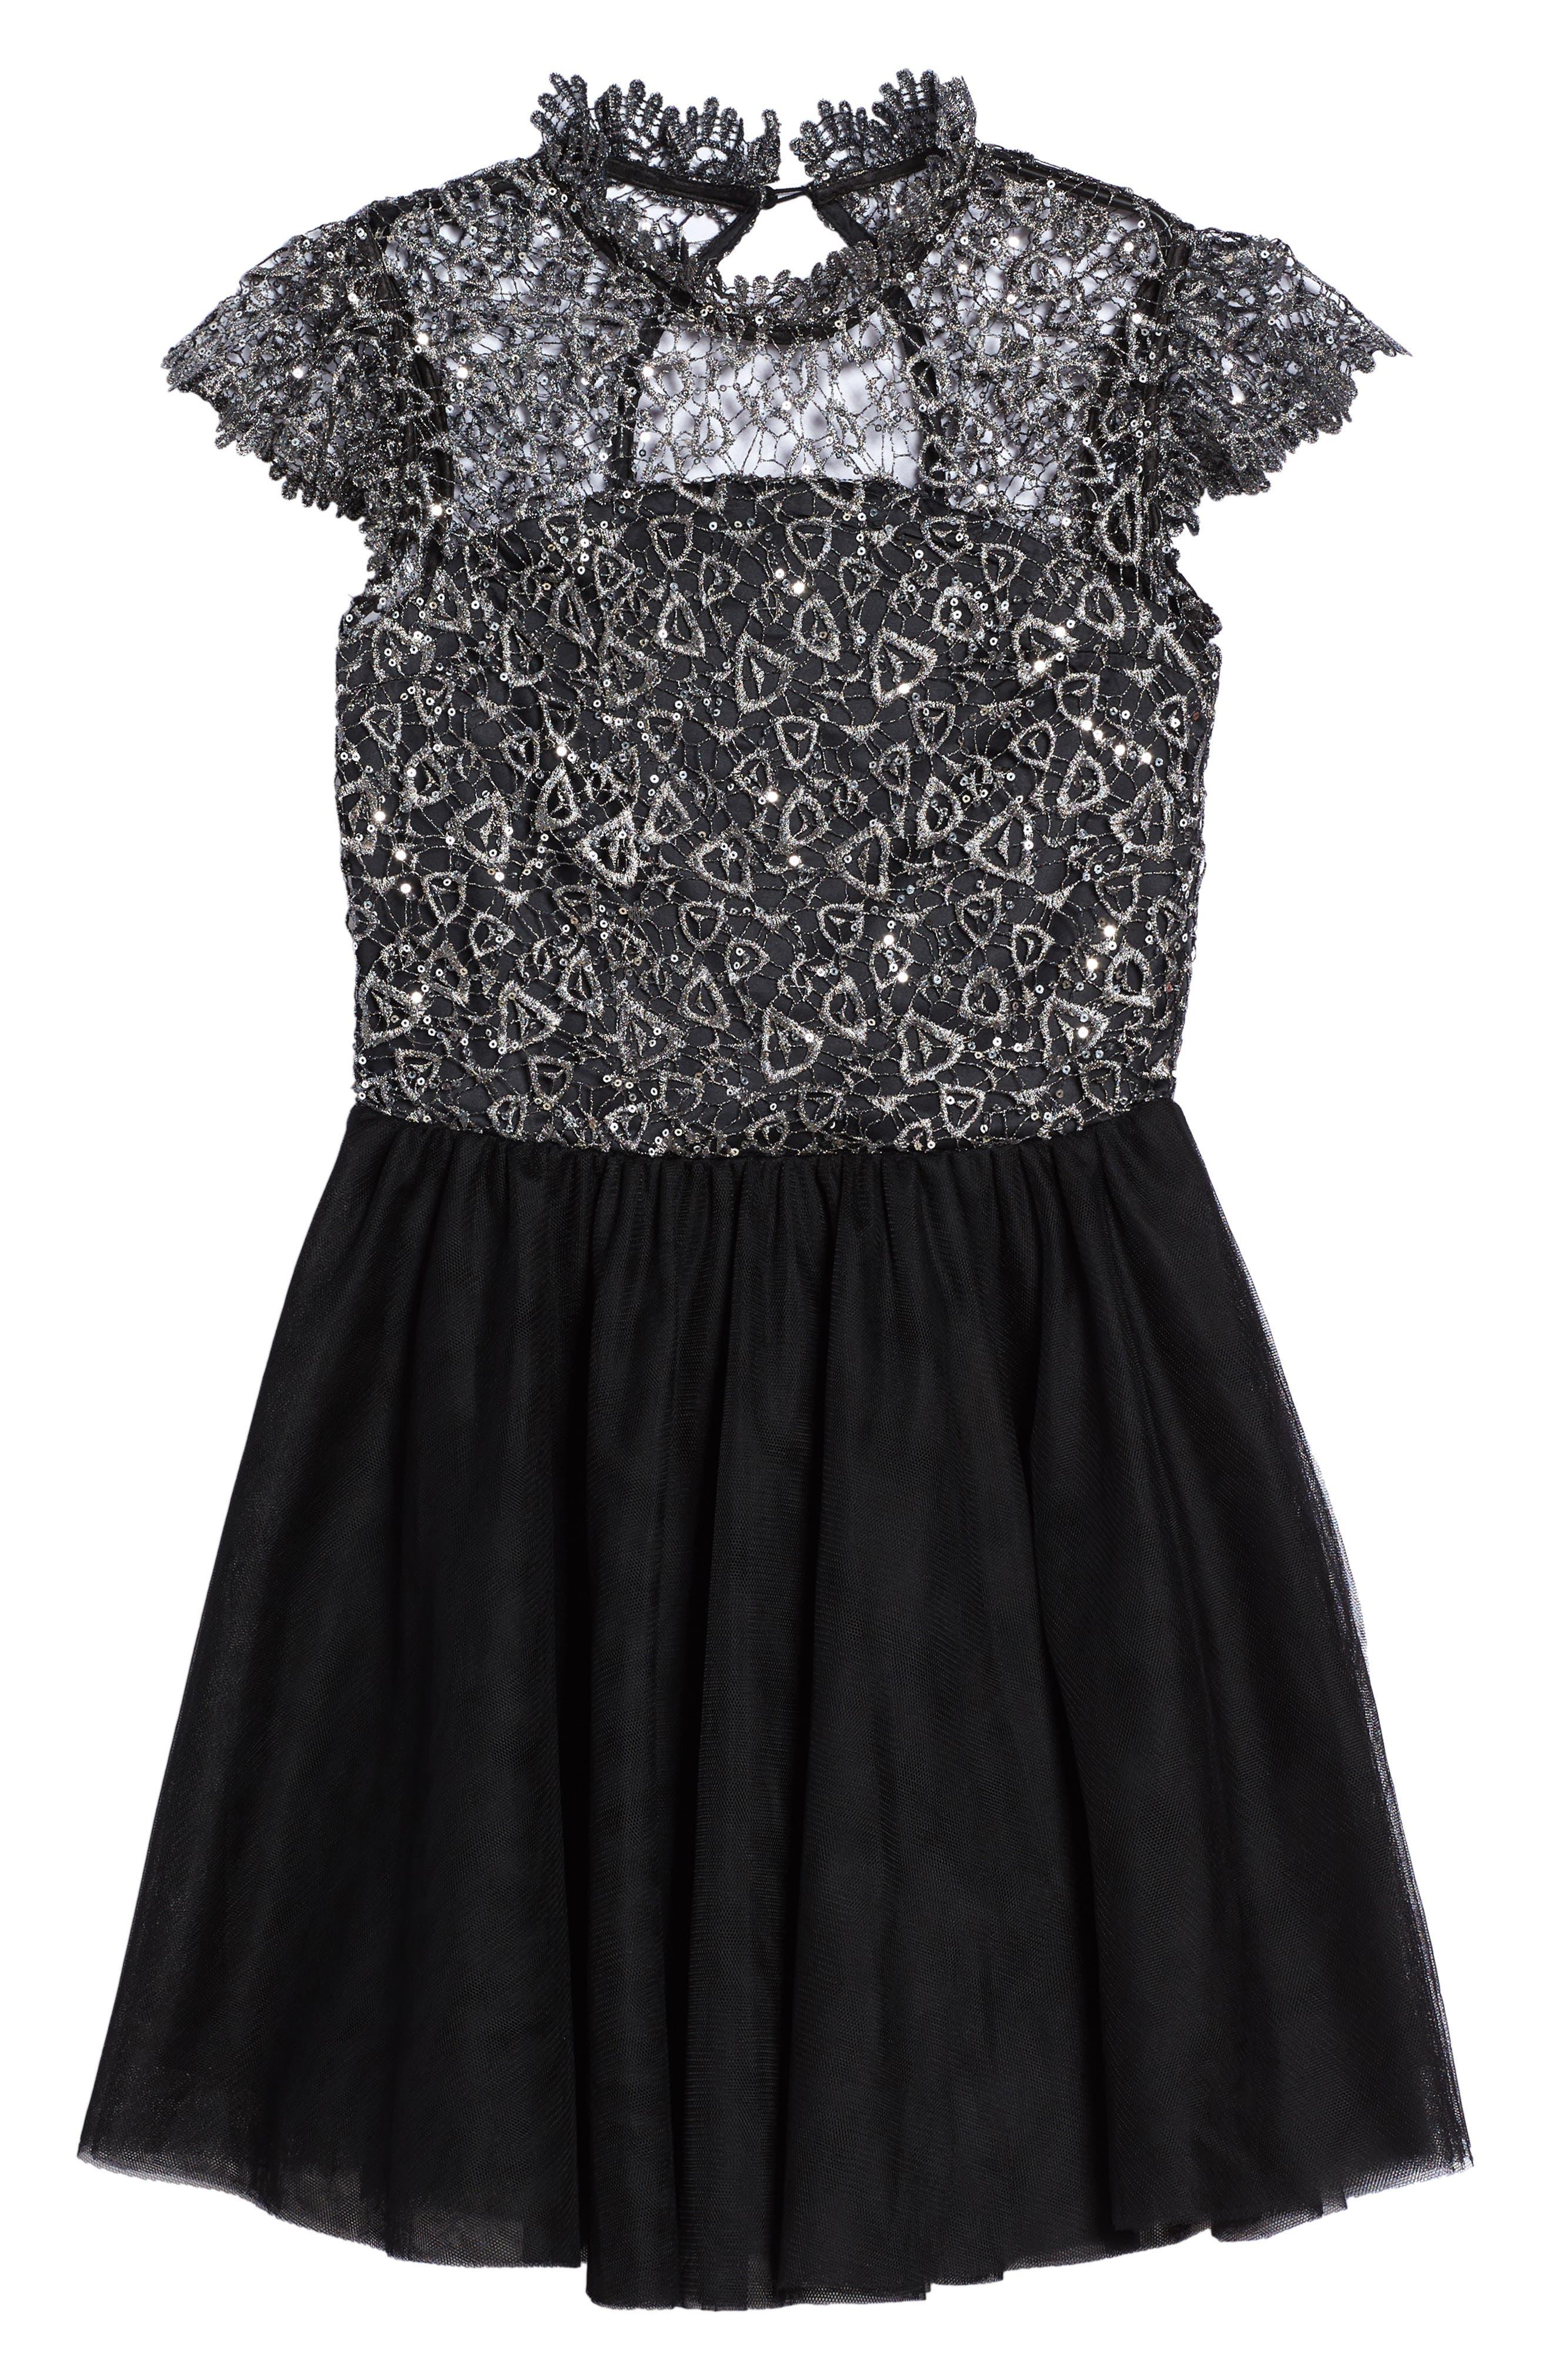 Bling Rocky Dress,                             Main thumbnail 1, color,                             Black